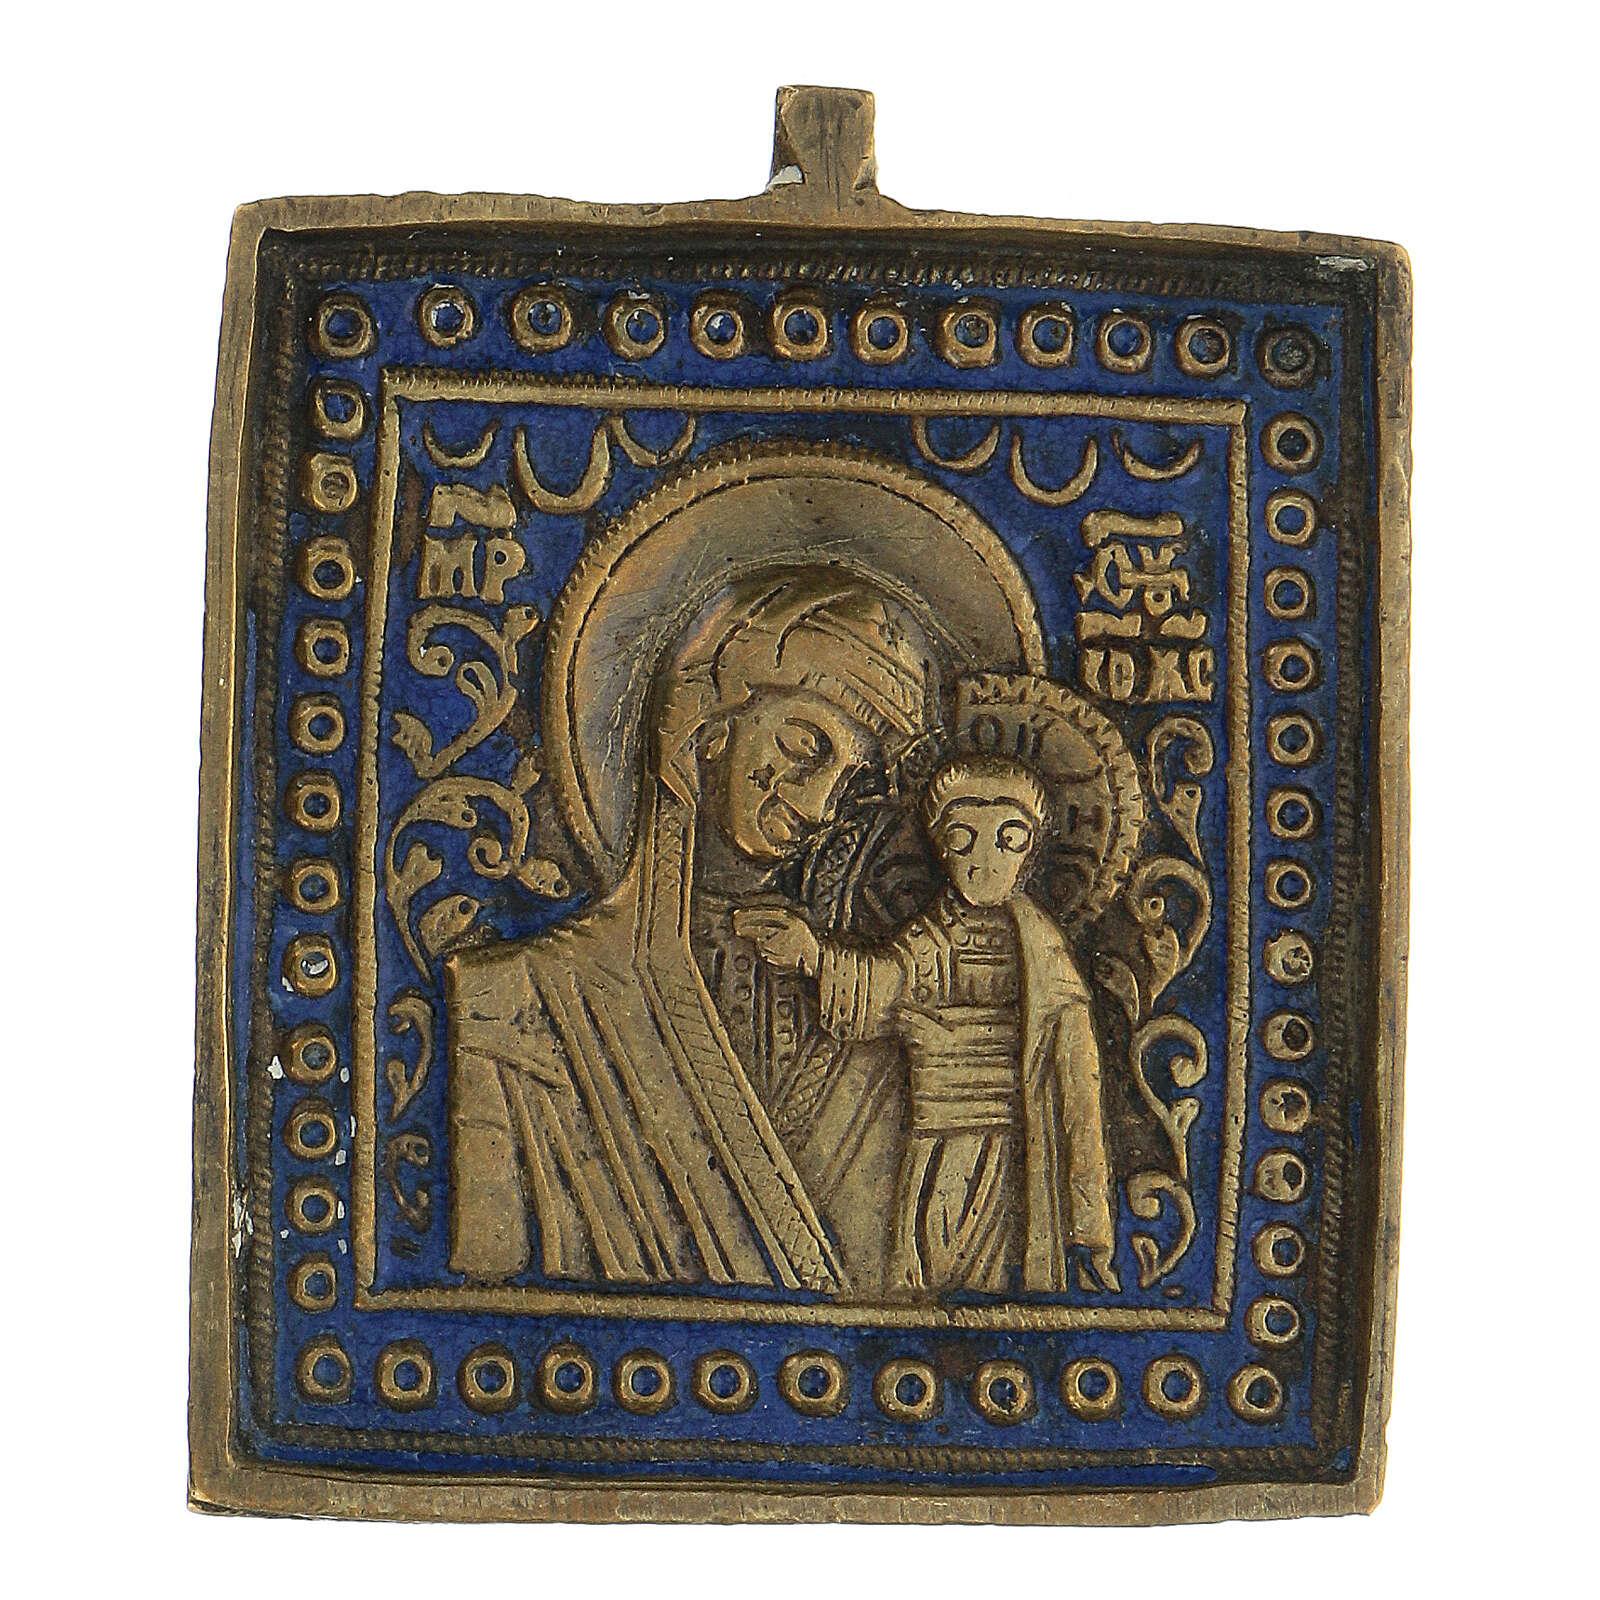 Bronze icône de voyage Vierge de Kazan Russie XIX siècle 5x5 cm 4